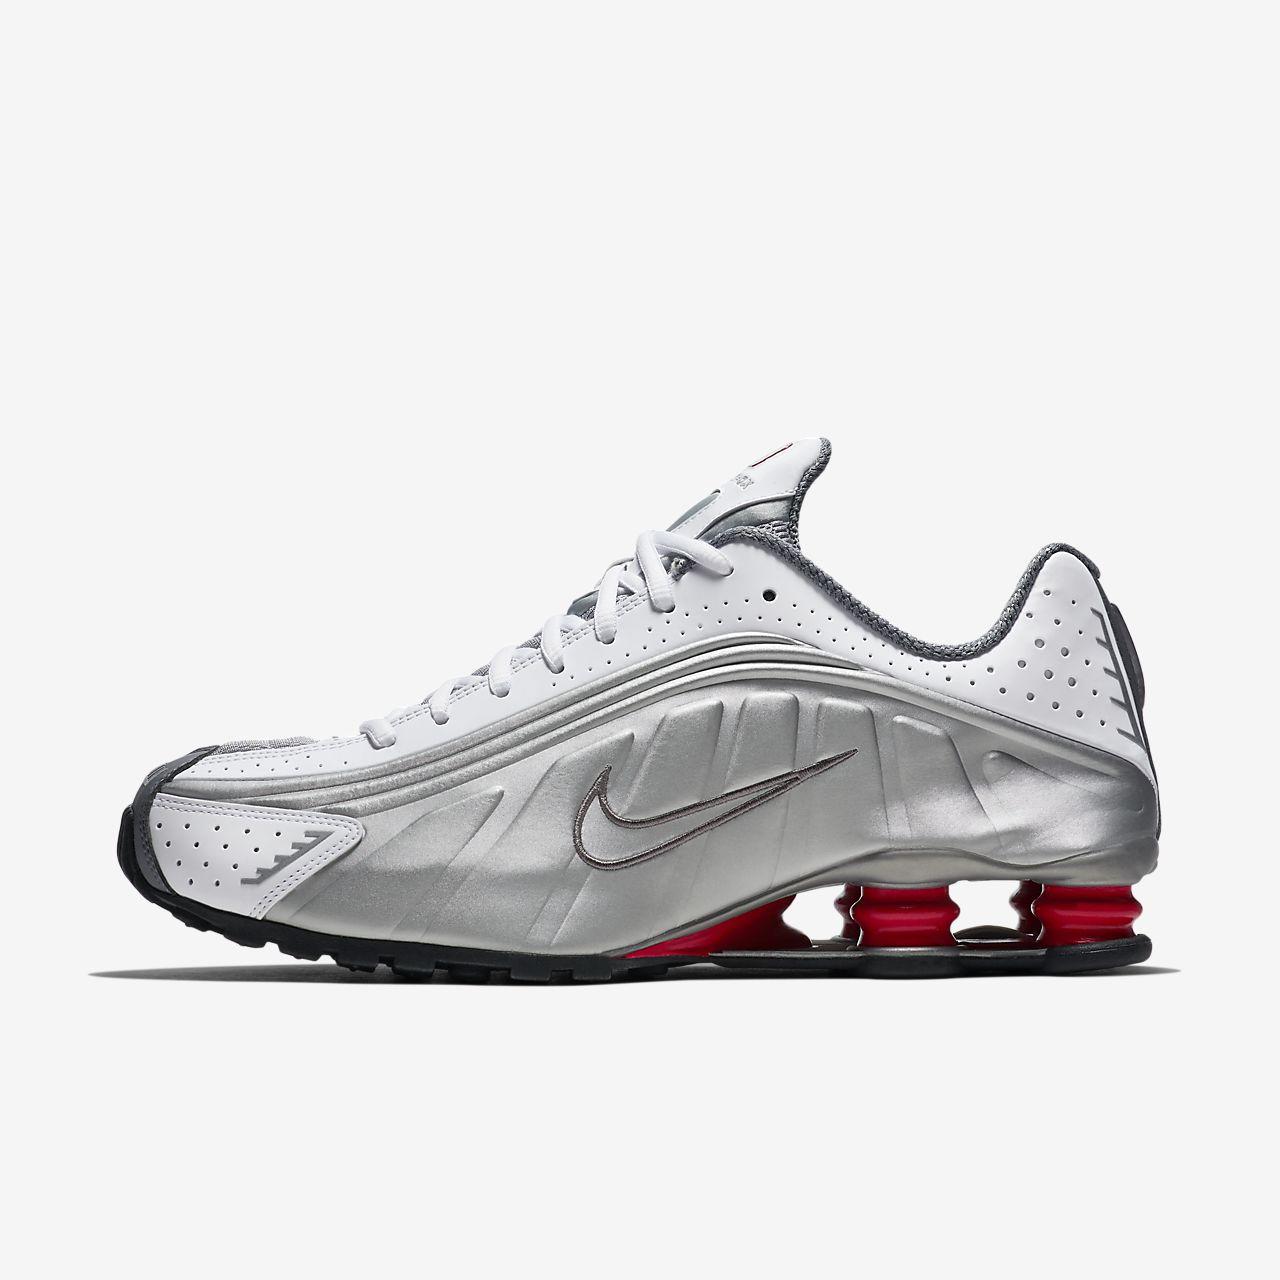 Nike Shox R4 Schuh